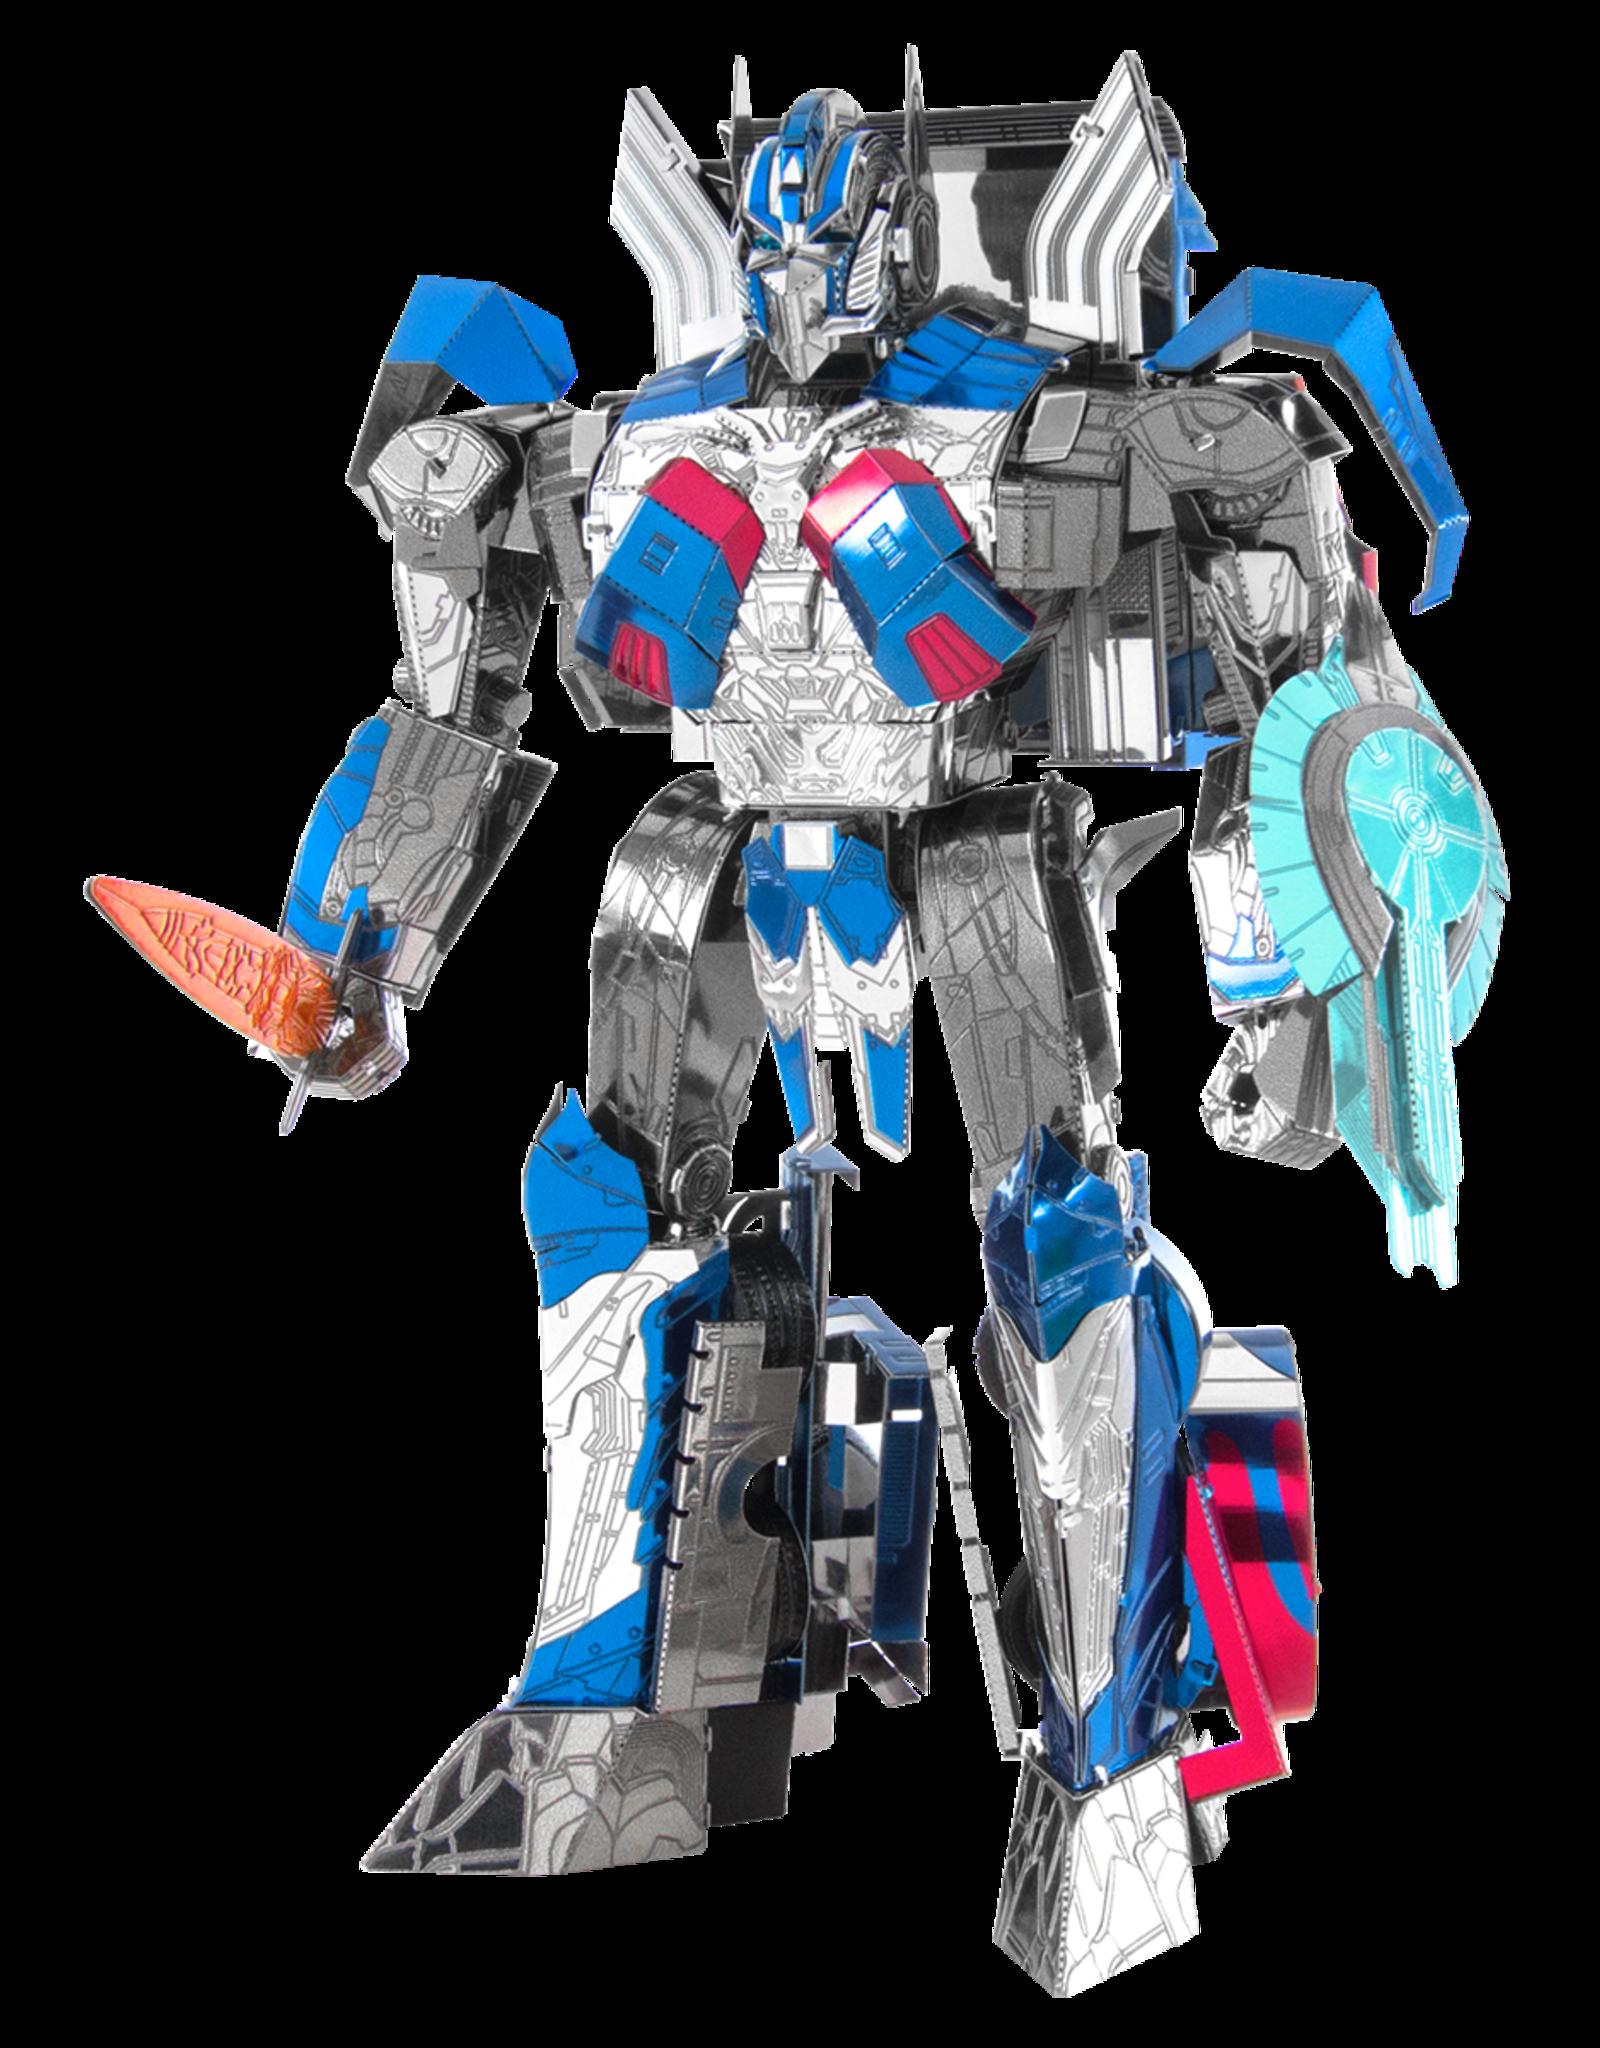 Metal Earth TRANSFORMERS Metal Earth ICONX - Optimus Prime